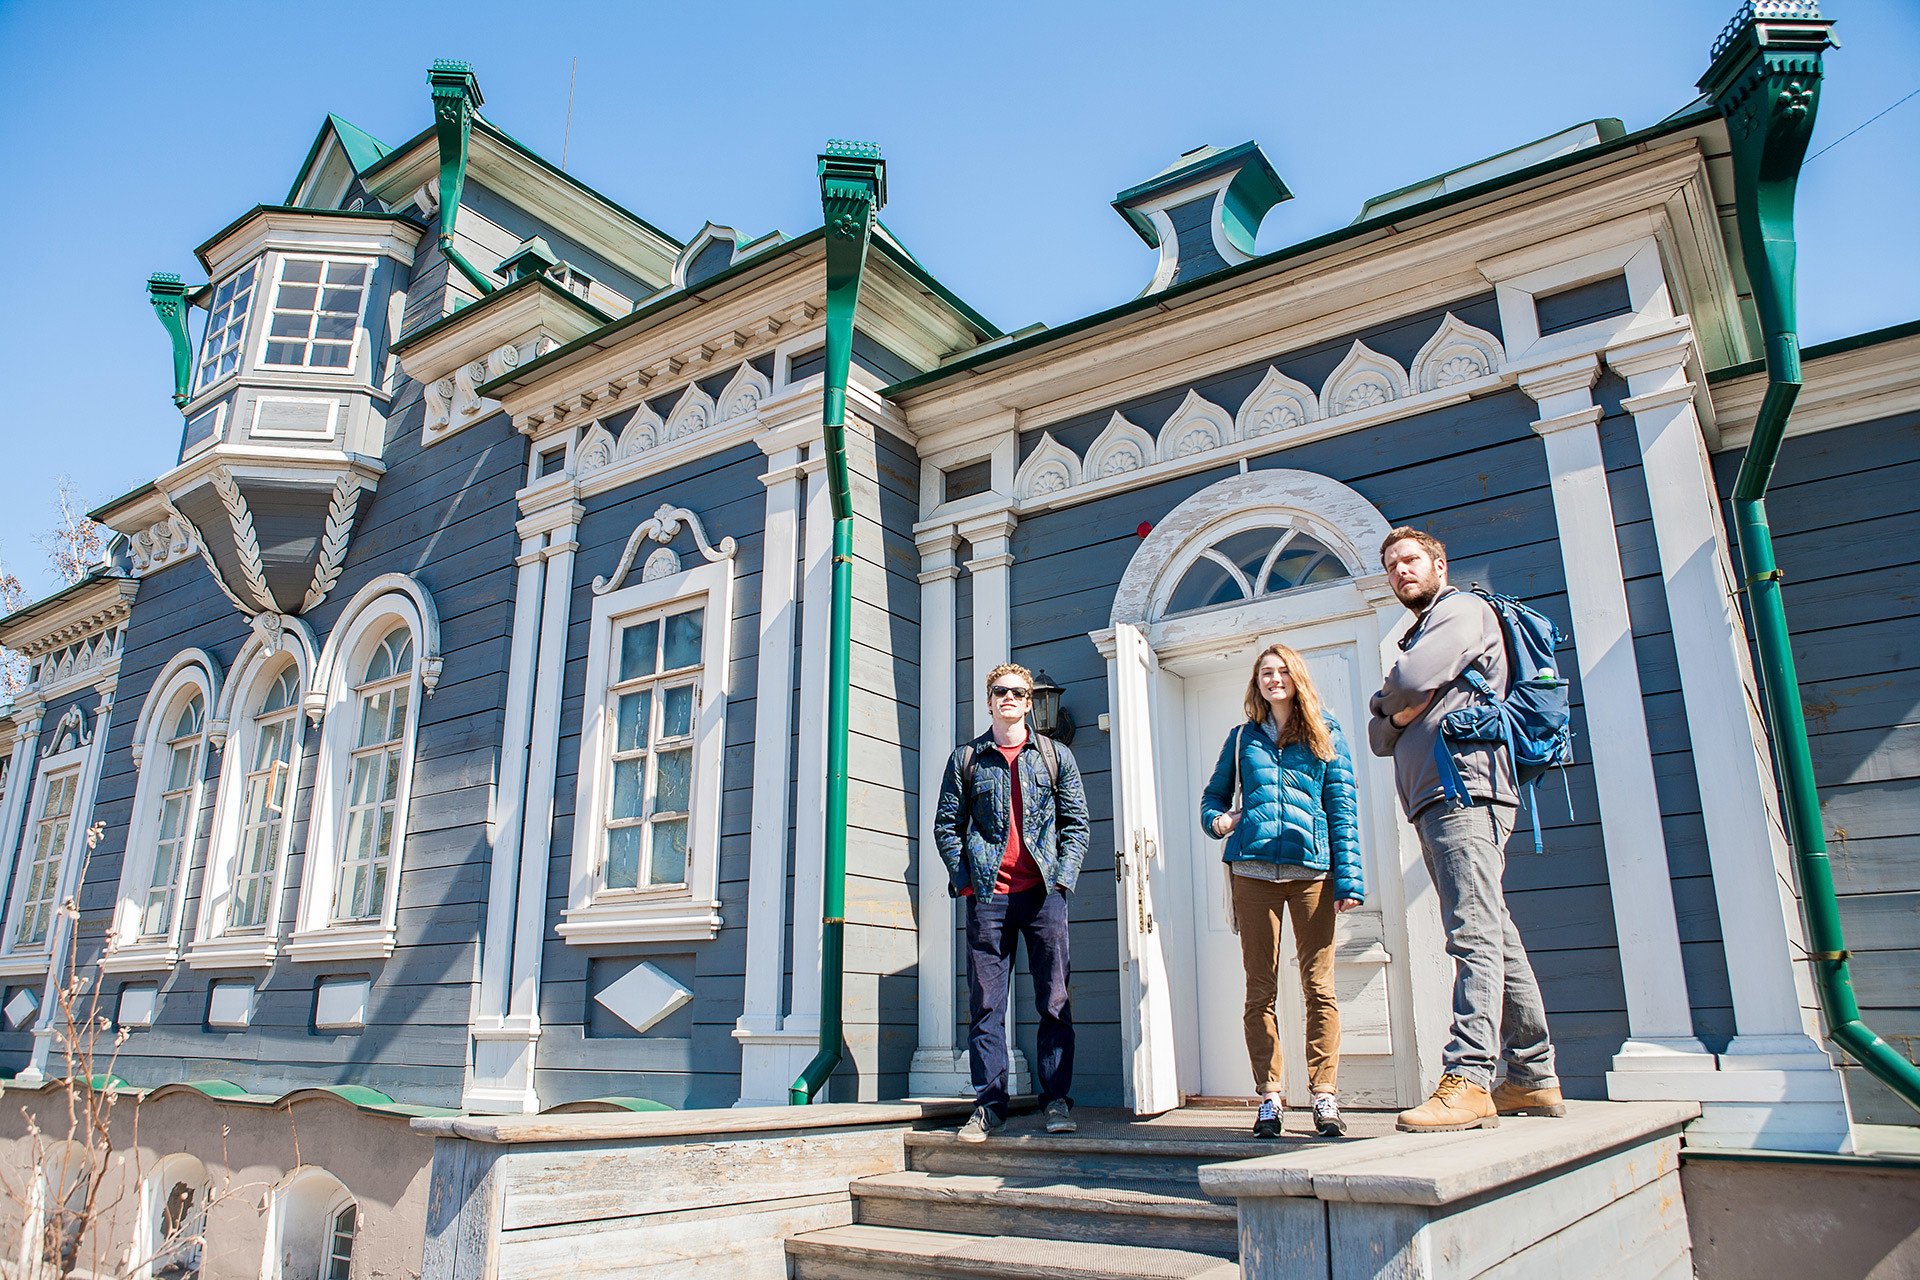 Muzej dekabrista.